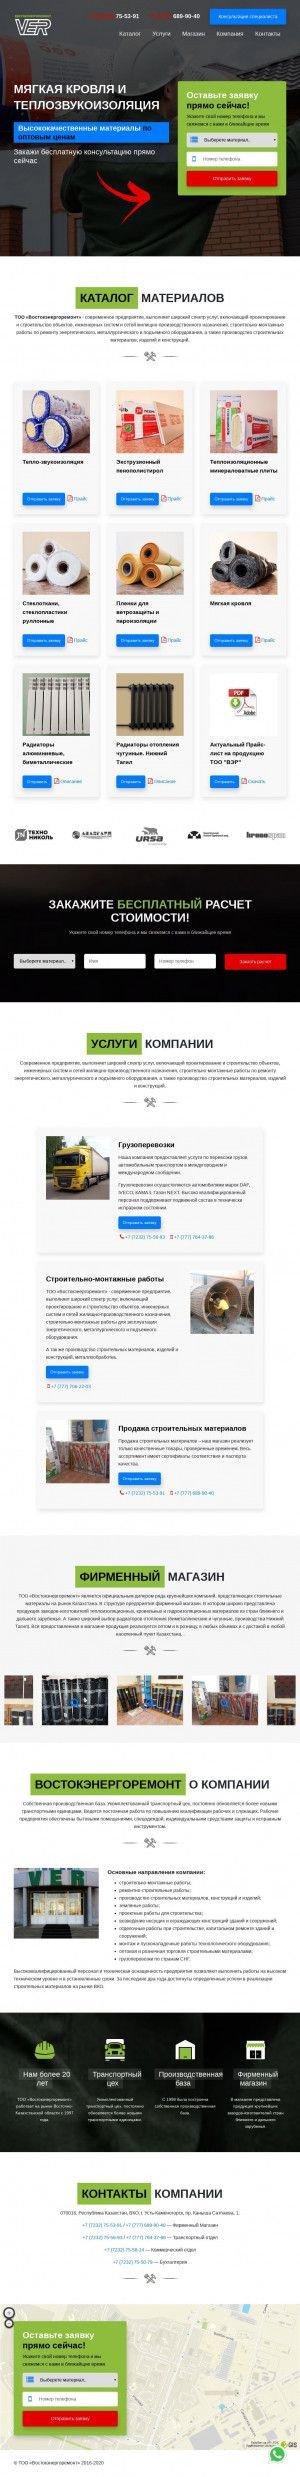 Предпросмотр для www.ver.kz — Востокэнергоремонт